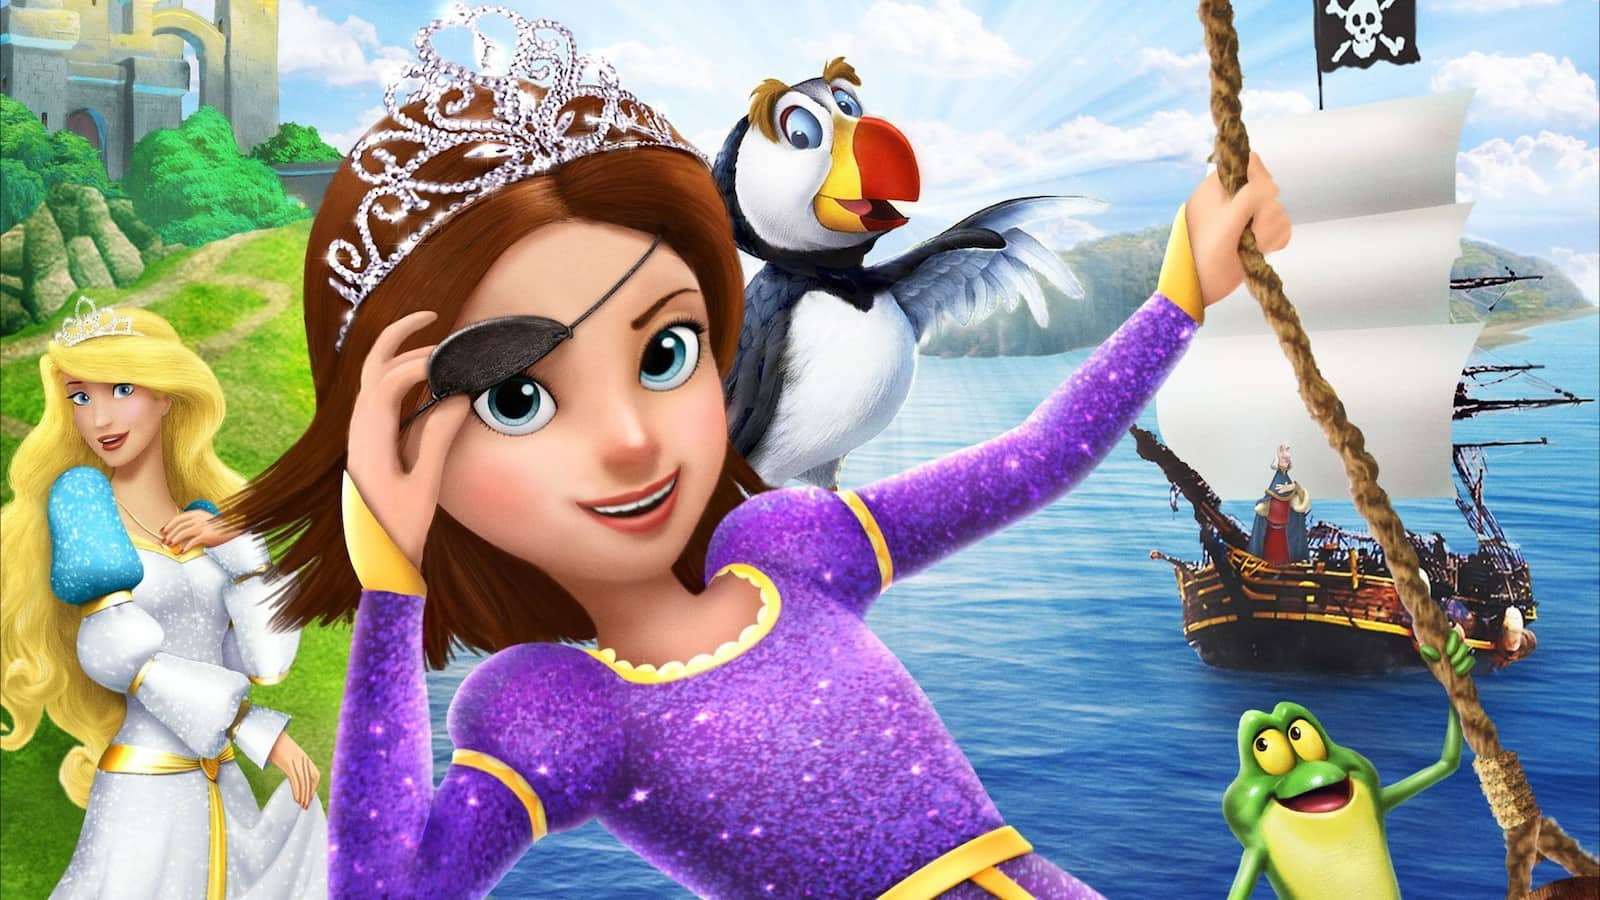 the-swan-princess-princess-tomorrow-pirate-today-2016